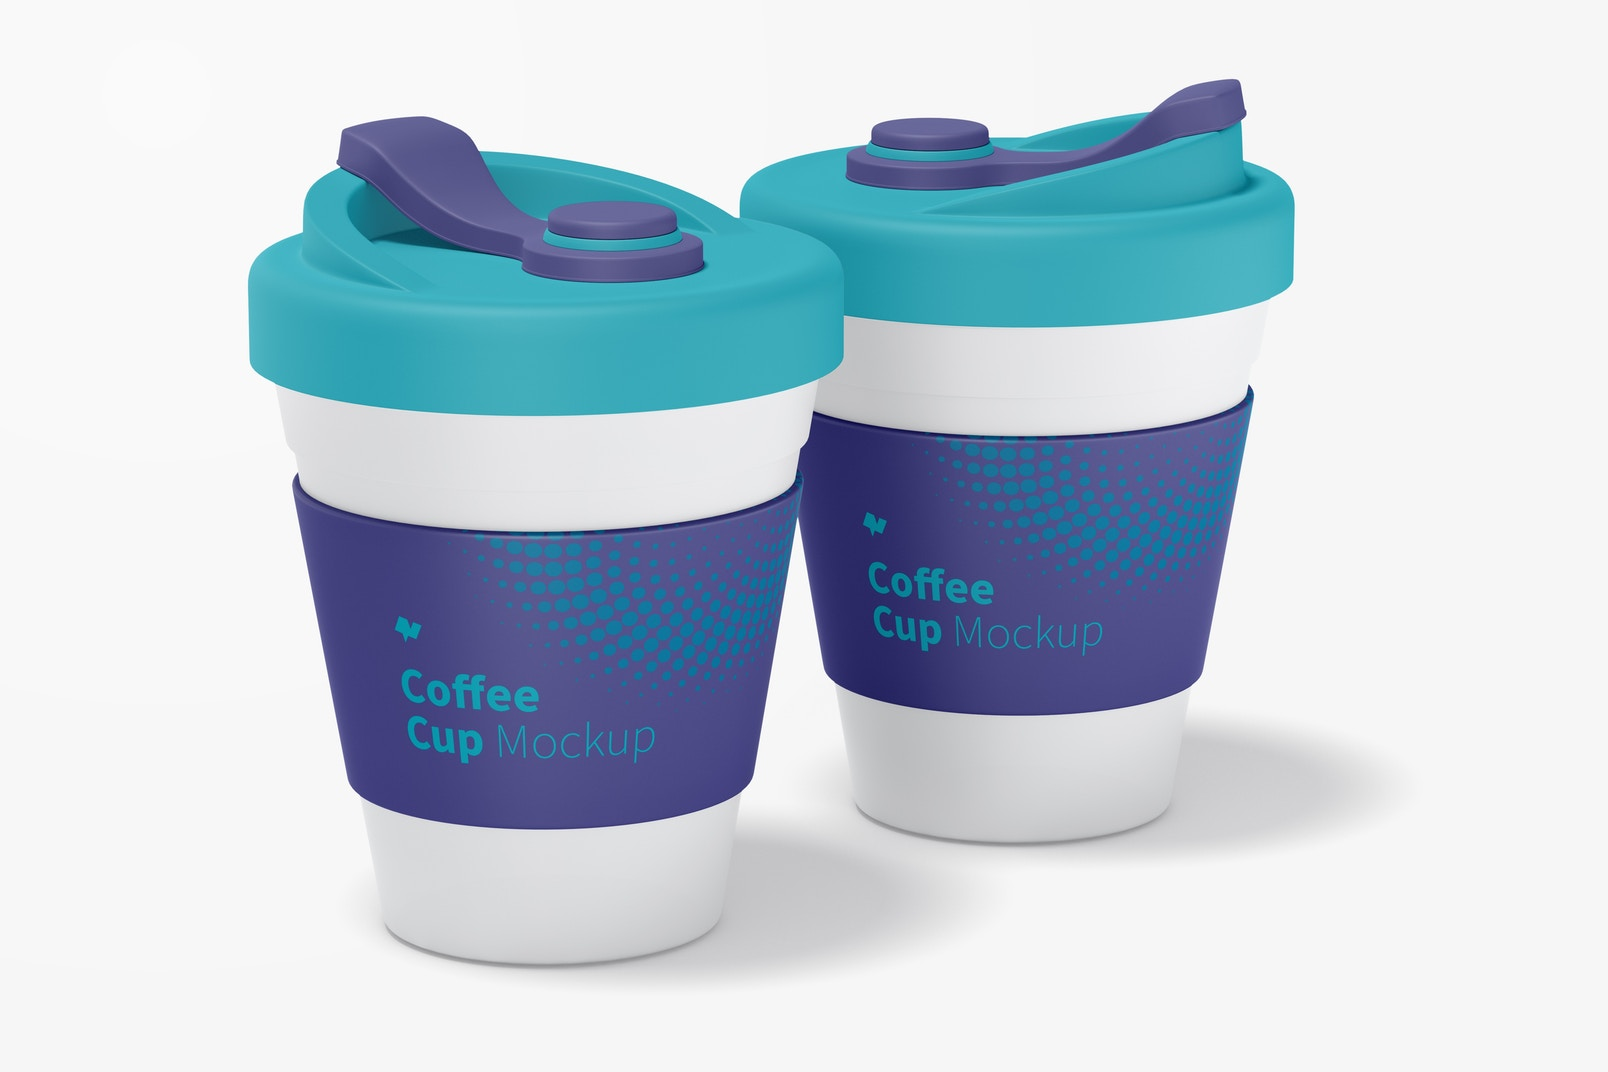 Coffee Cups with Lid Mockup